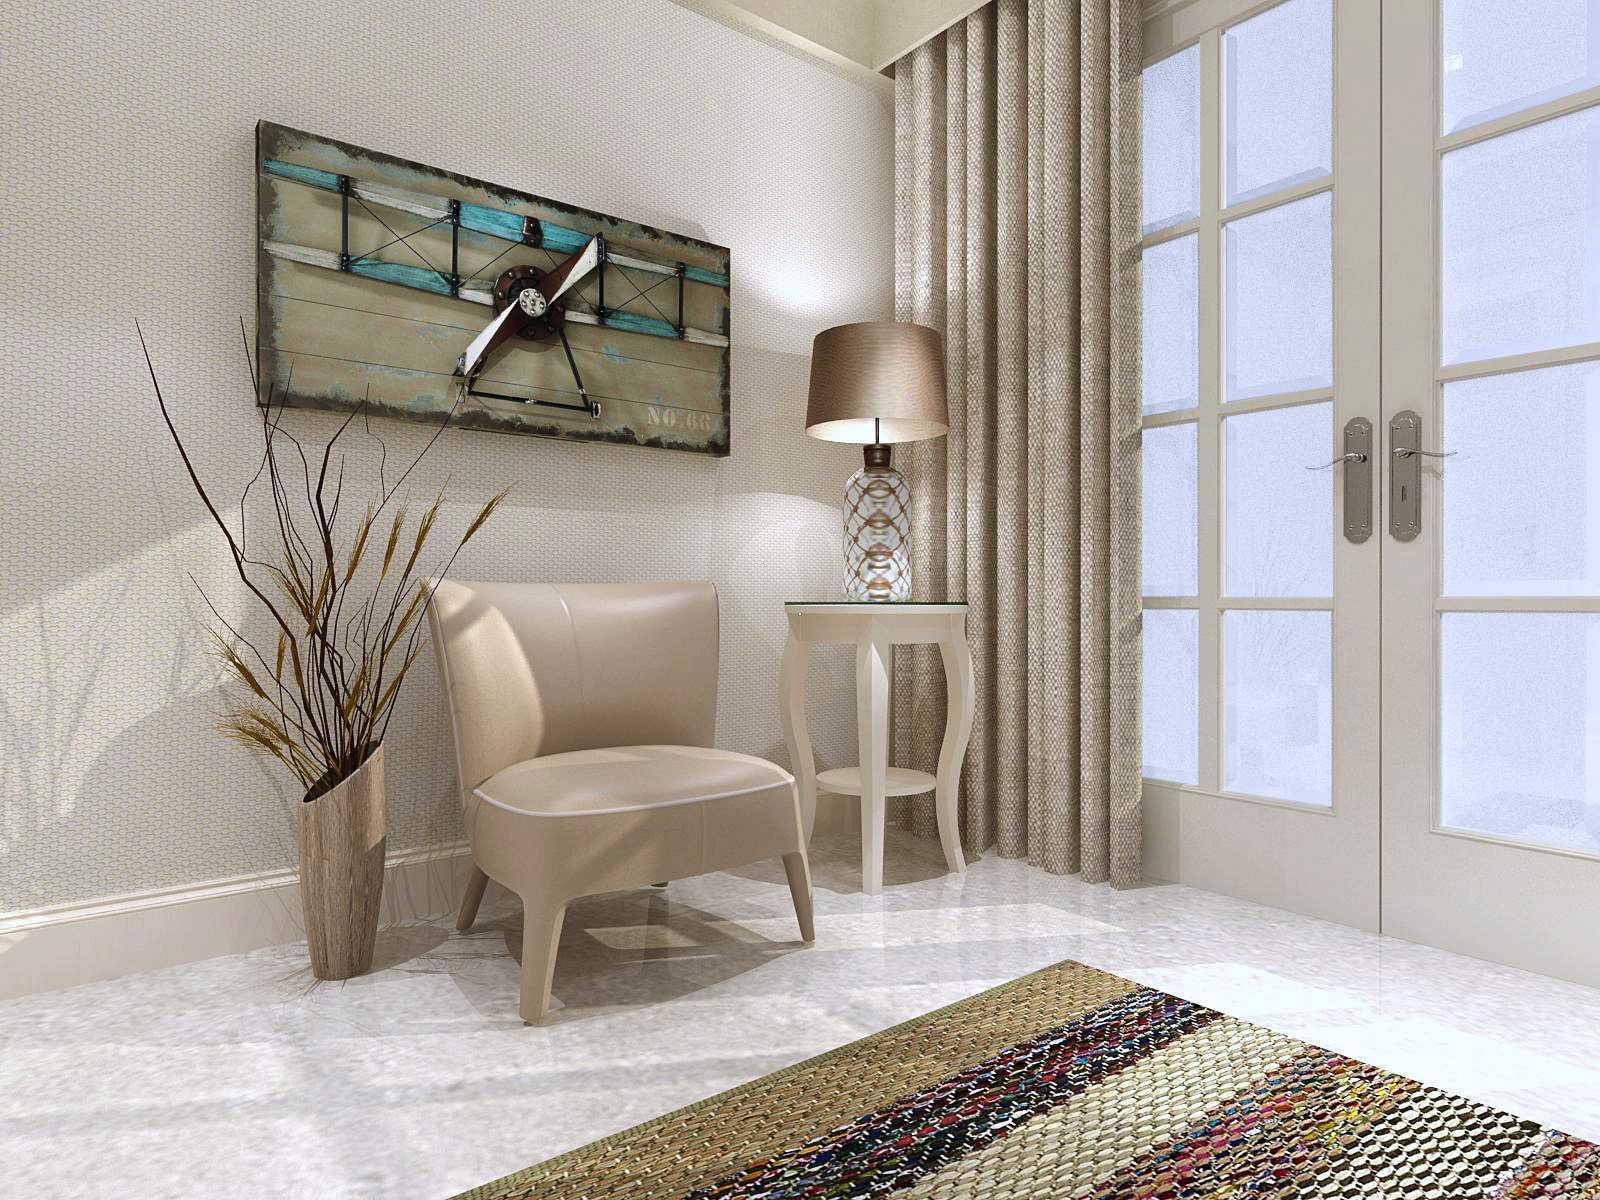 Caesar® | Development & Studio Shabby Chic - Farm House ,home Design Bandung, Kota Bandung, Jawa Barat, Indonesia Bandung, Kota Bandung, Jawa Barat, Indonesia Caesar-Development-Studio-Shabby-Chic-Farm-House-Home-Design  67157